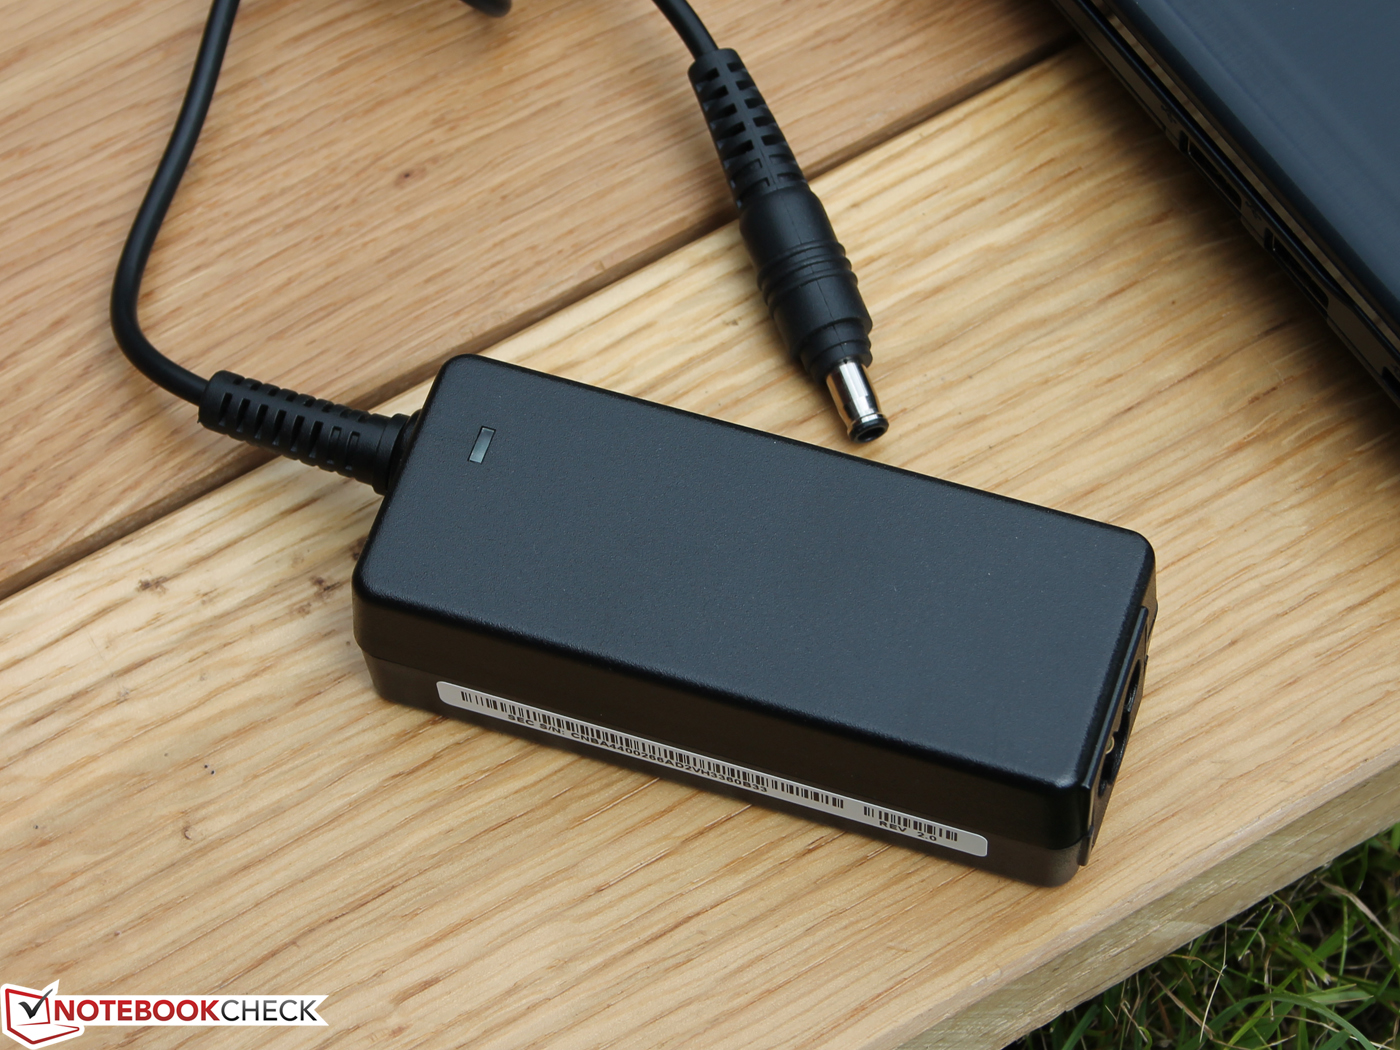 Samsung notebook hoyt6yx - 40 Watt Psu